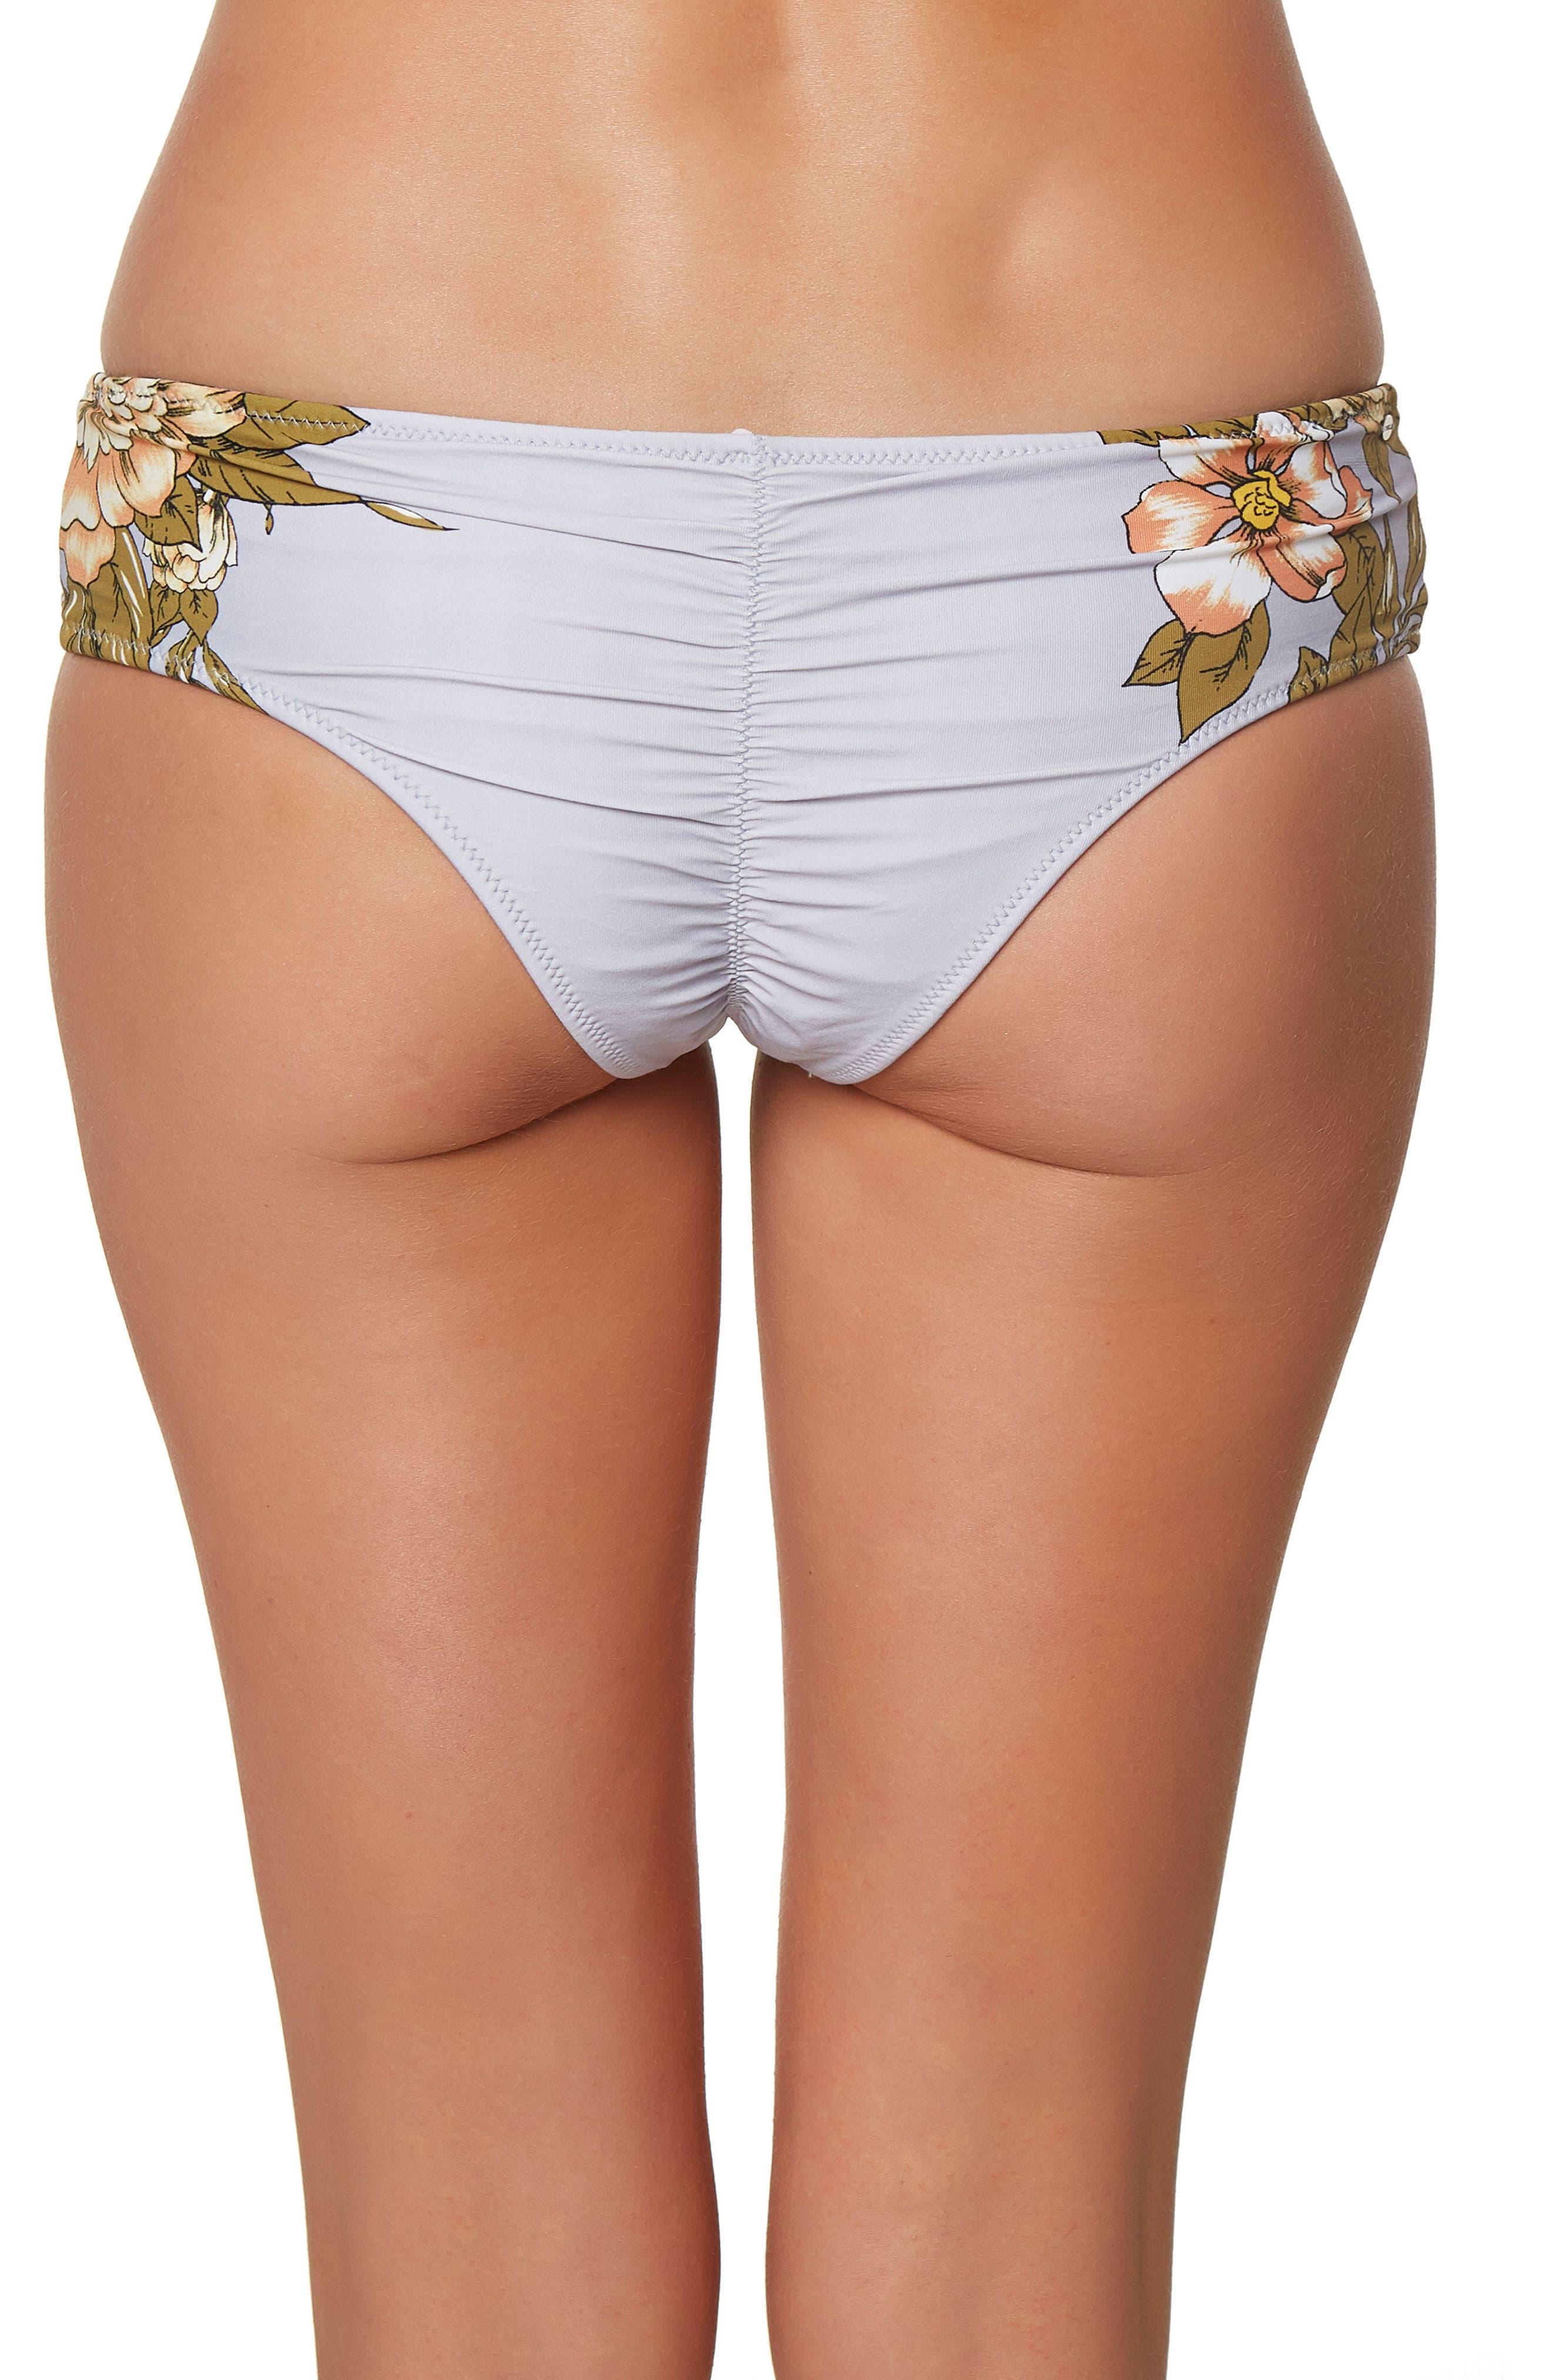 Aloha Floral Revo Hipster Bikini Bottoms,                             Alternate thumbnail 2, color,                             020